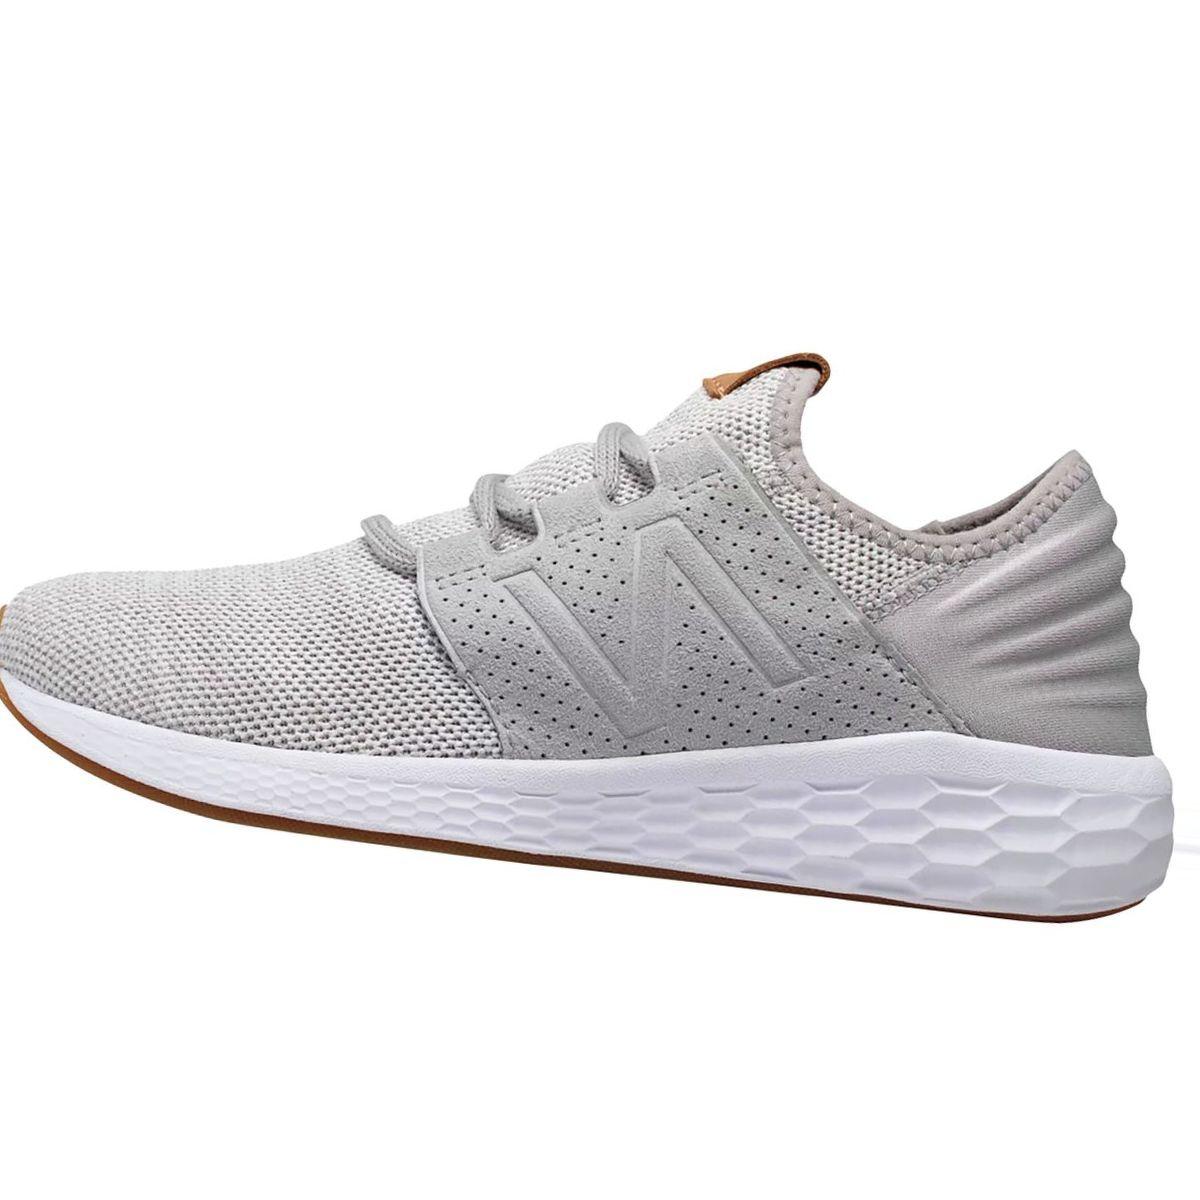 New Balance Fresh Foam Cruz v2 Knit Running Shoe - Women's